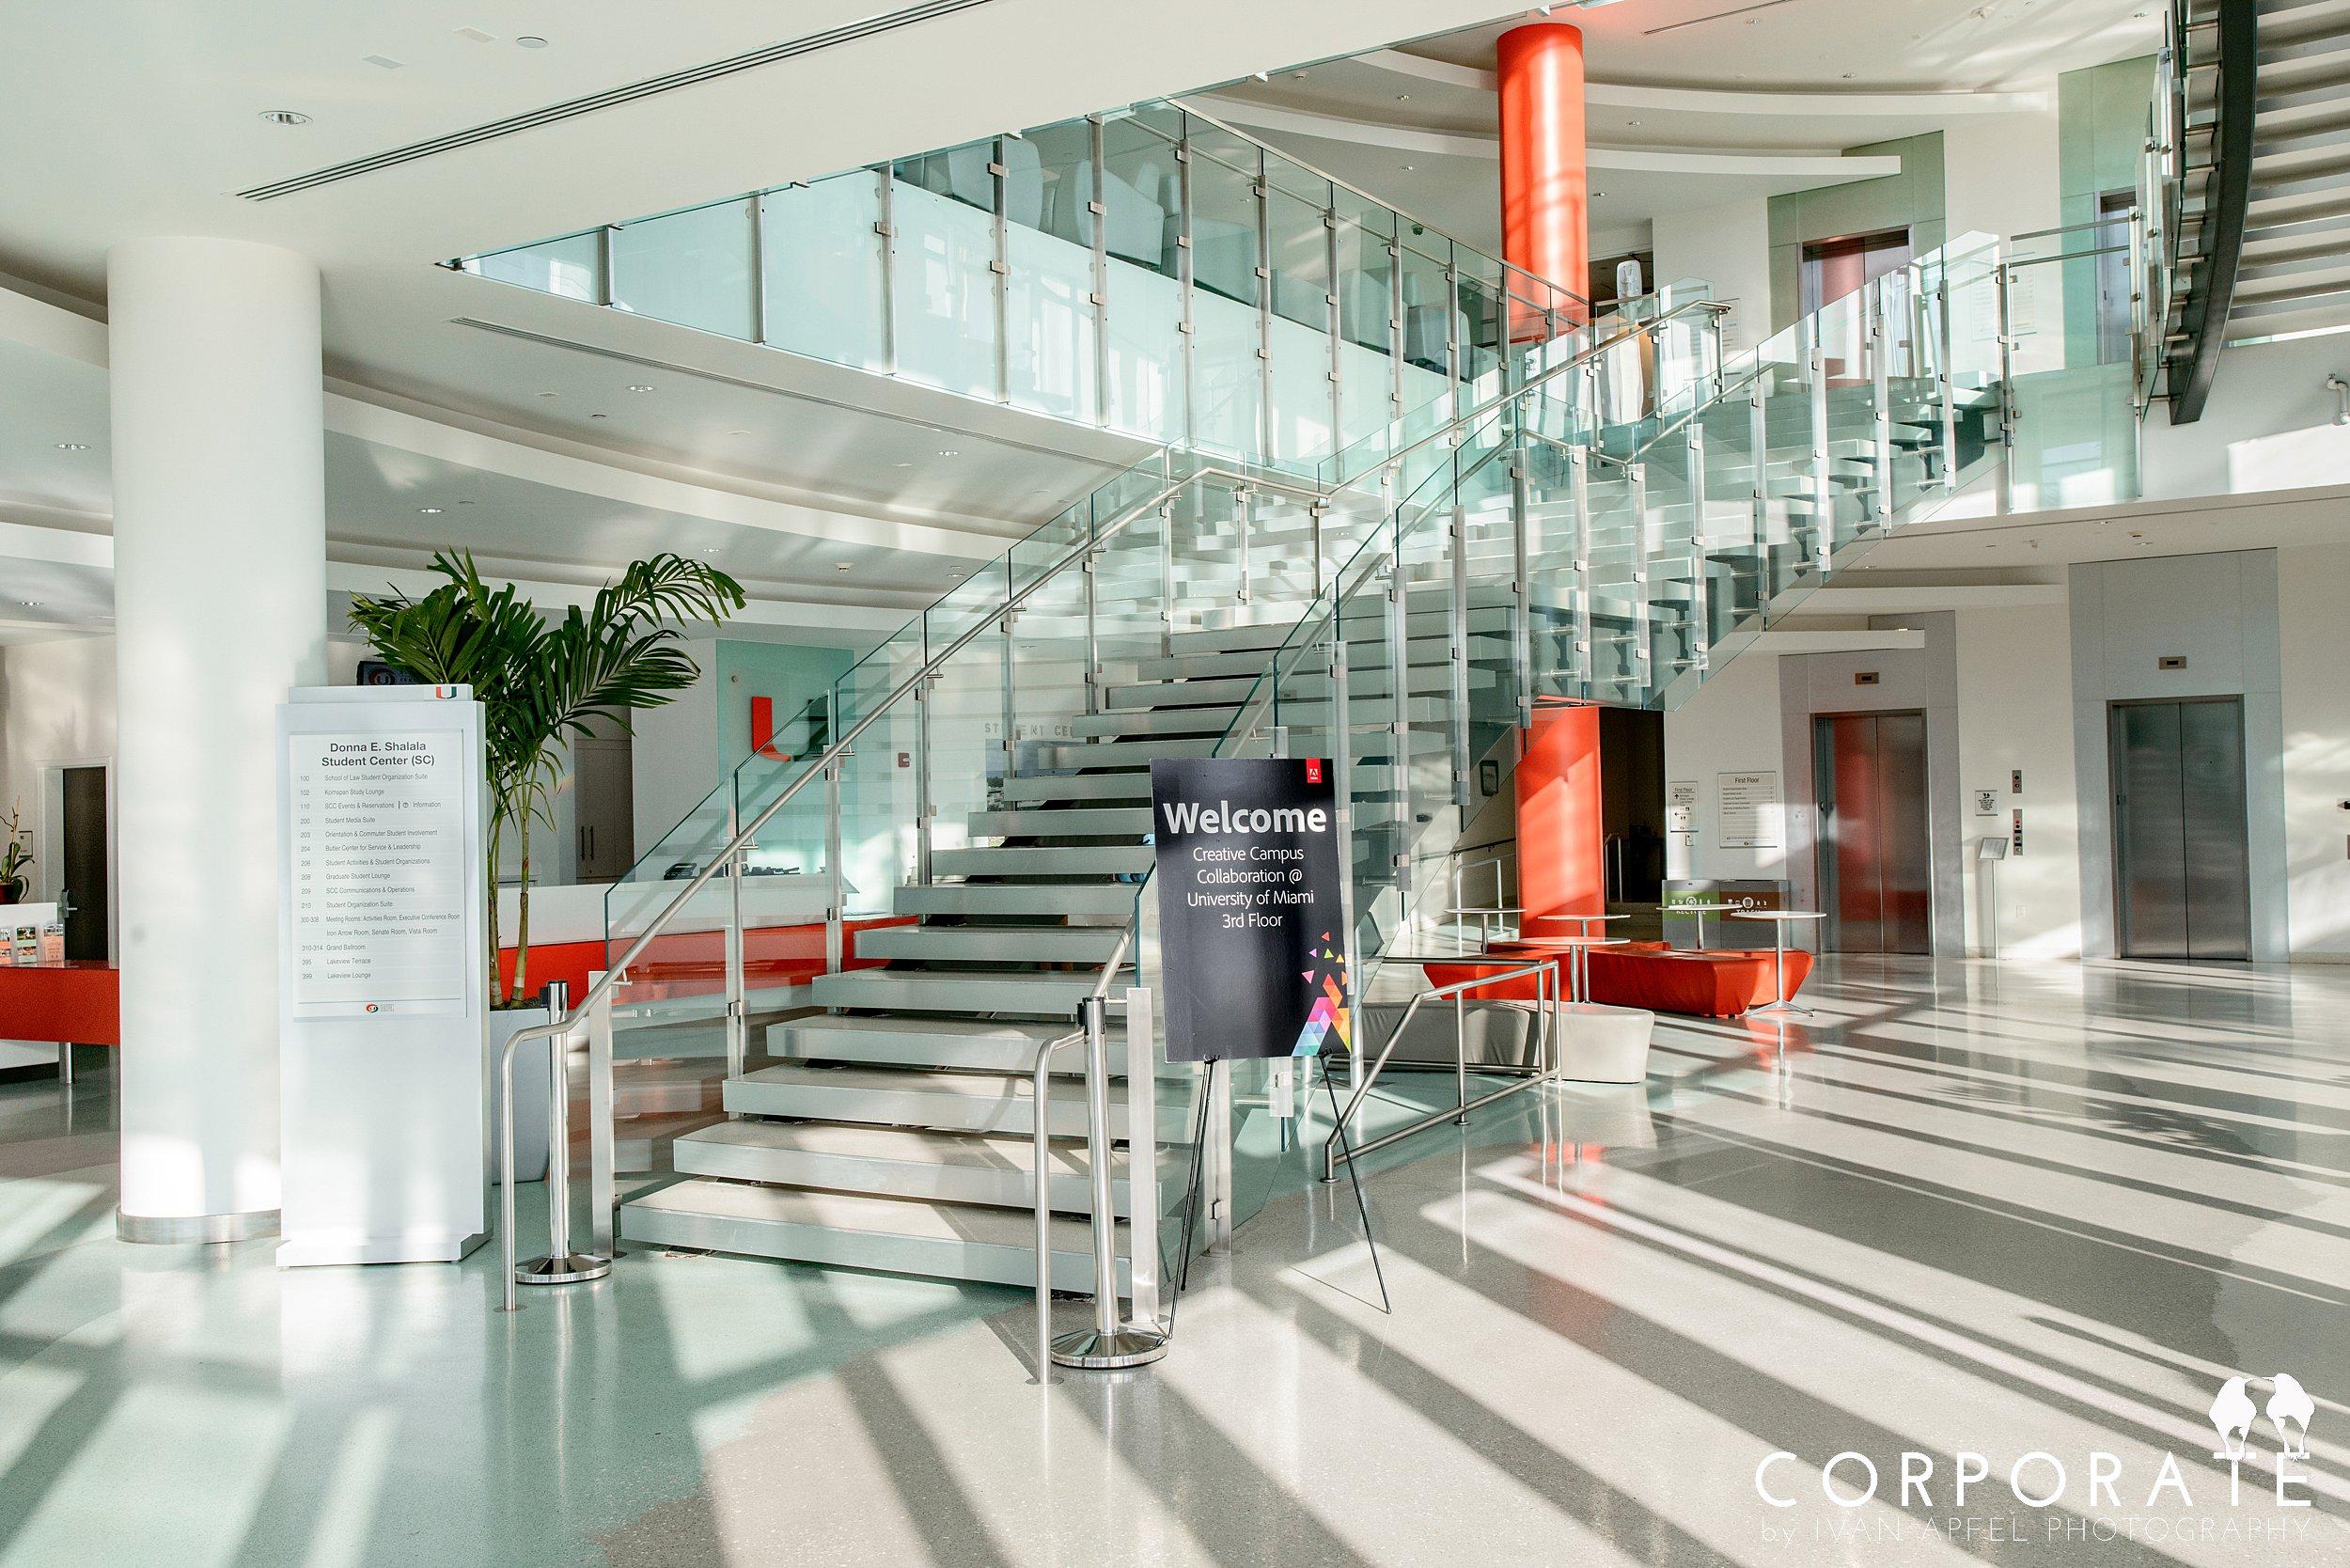 Miami Corporate Event Photographer Adobe Systems Creative Campus 2019-D2_Adobe_Creative_Campus_UMiami-_IAP8241.jpg